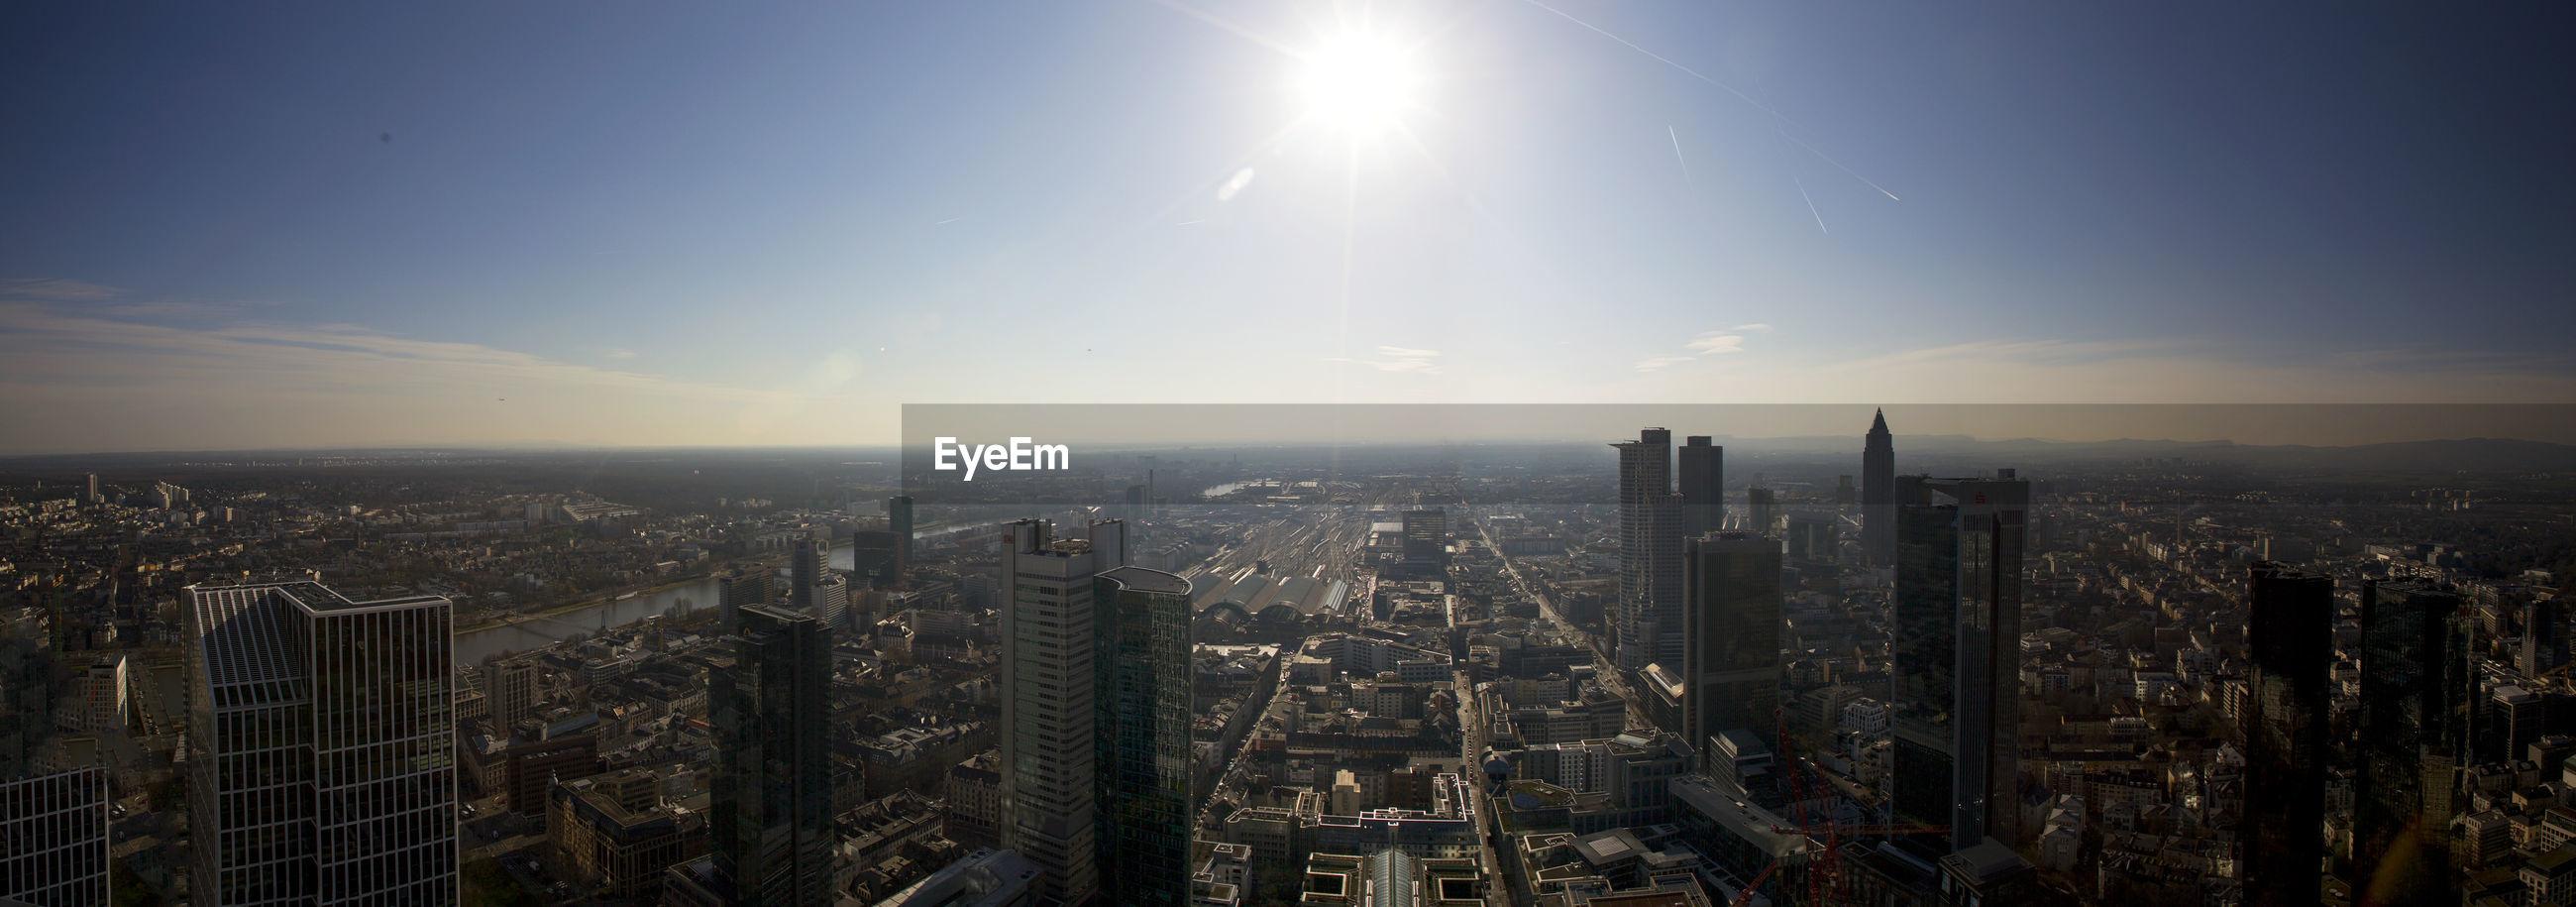 AERIAL VIEW OF MODERN BUILDINGS IN CITY AGAINST BRIGHT SKY